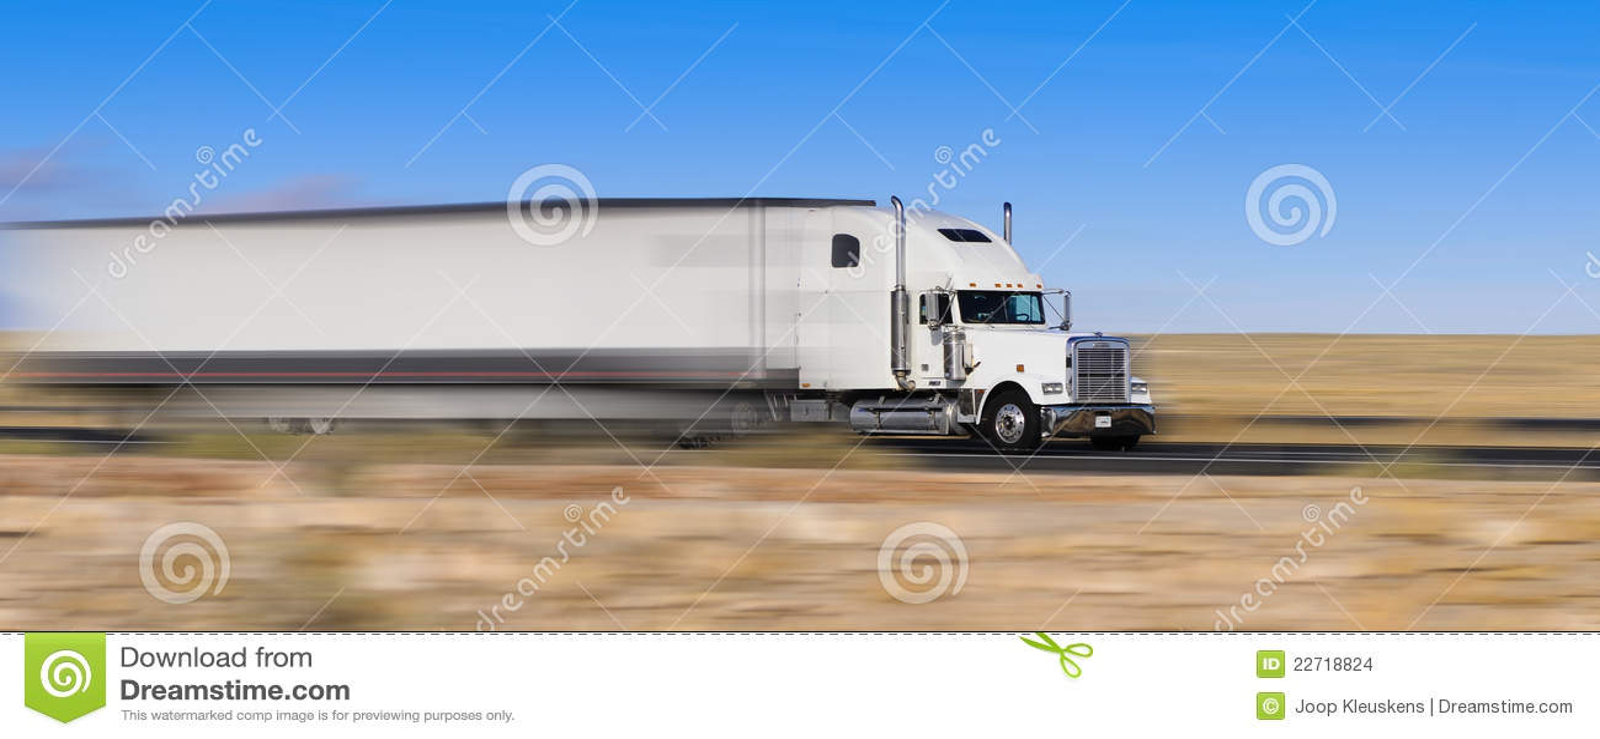 Camion sul movimento